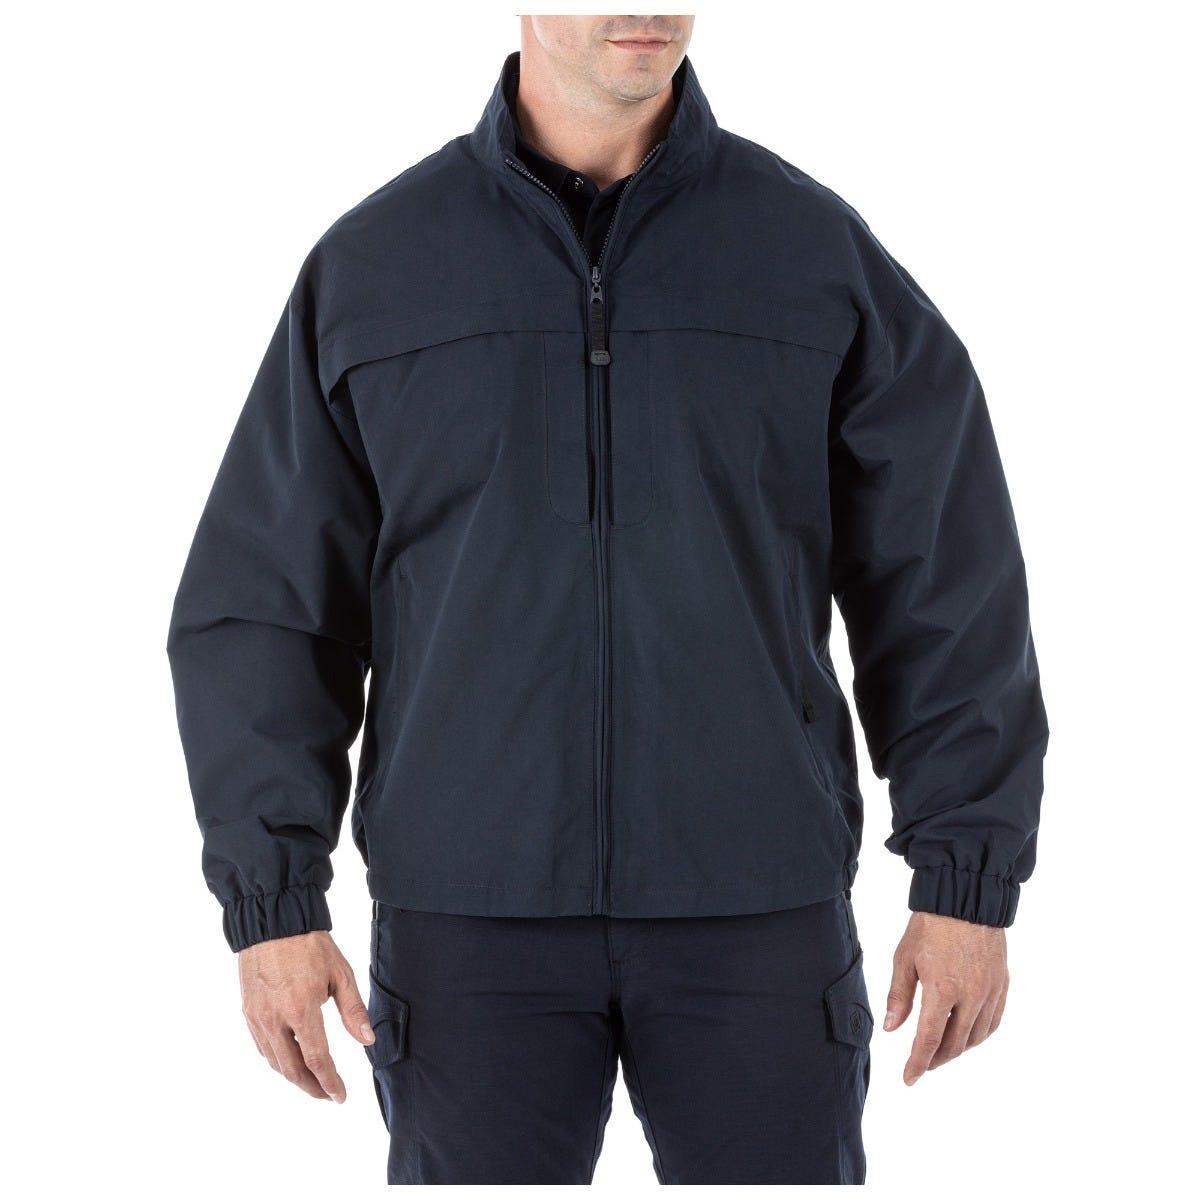 5.11 Tactical Men's Response Jacket™ (Blue)